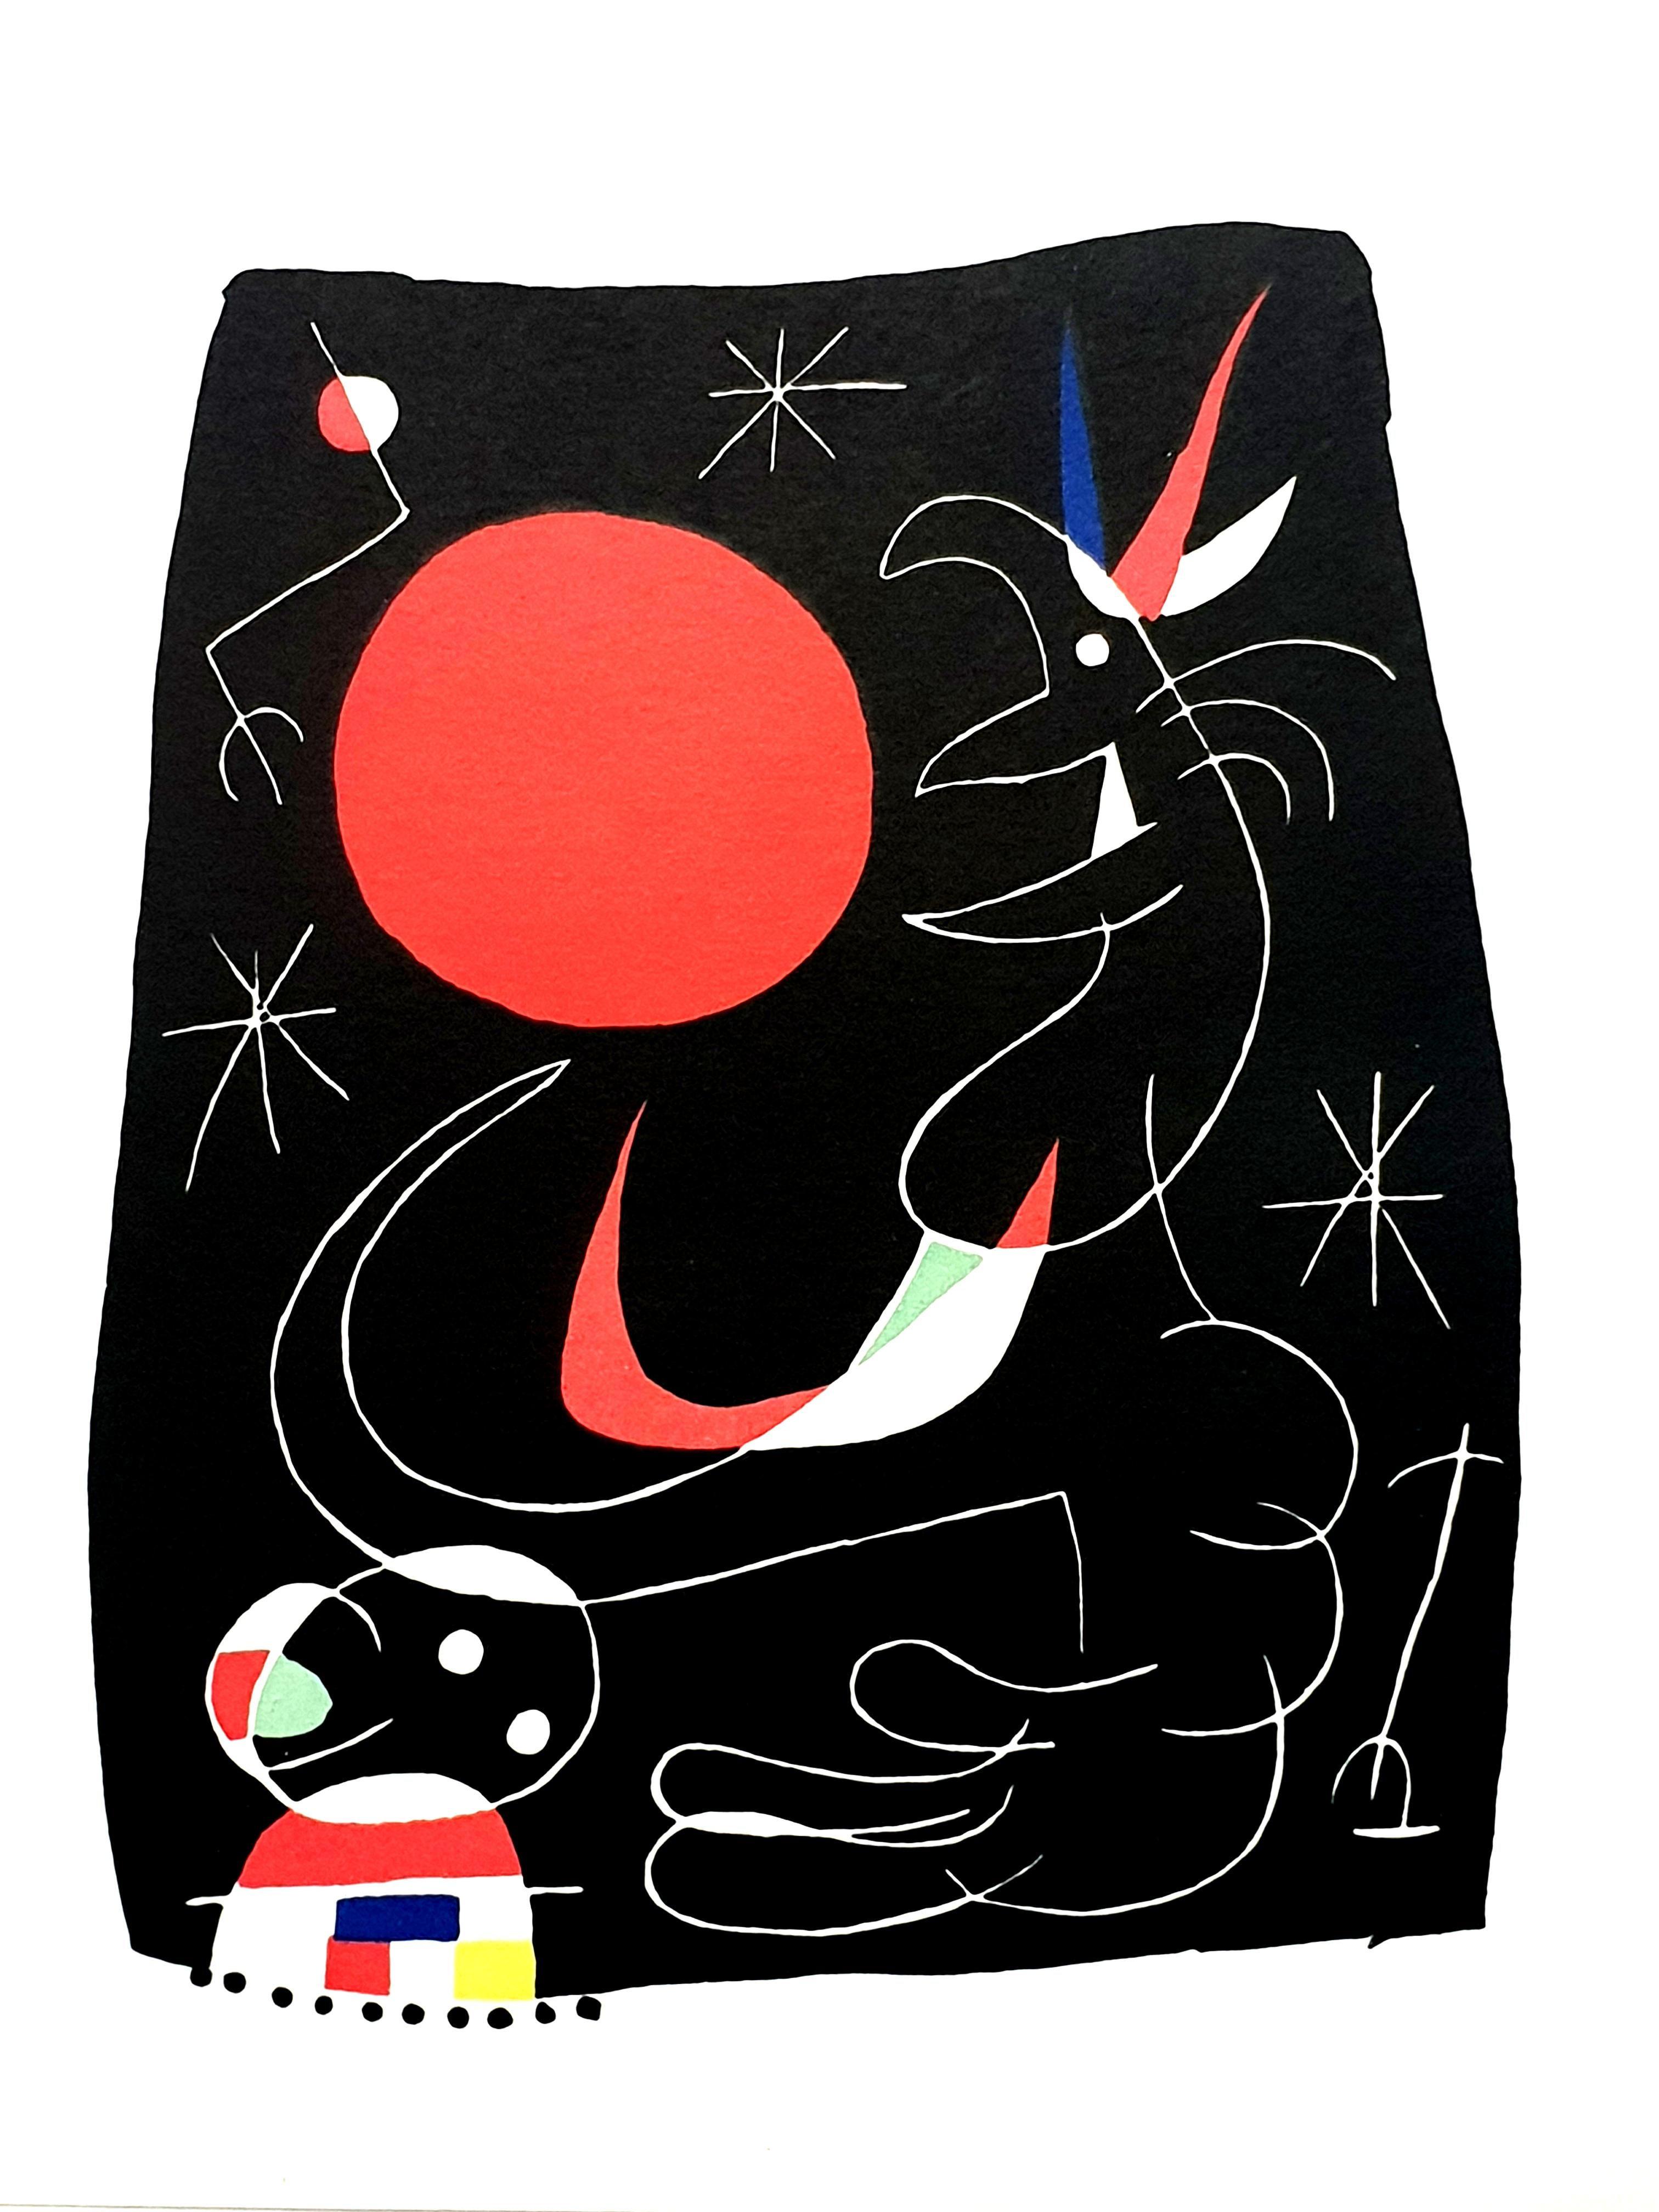 Joan Miro - Night Sky - Original Lithograph